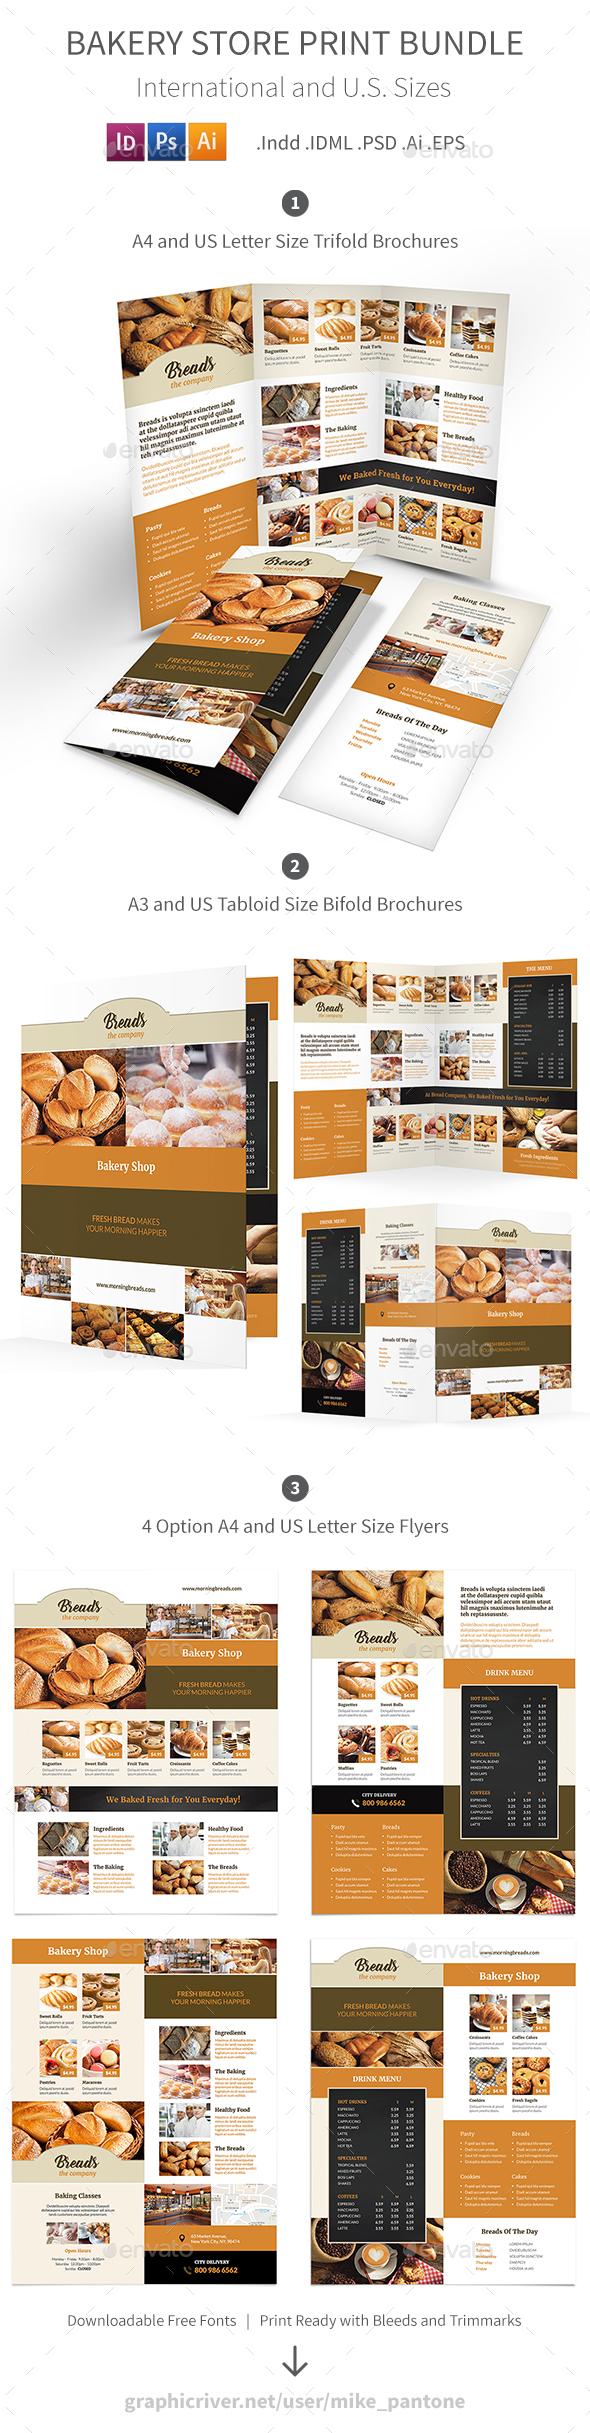 Bakery Store Print Bundle 2 - Informational Brochures